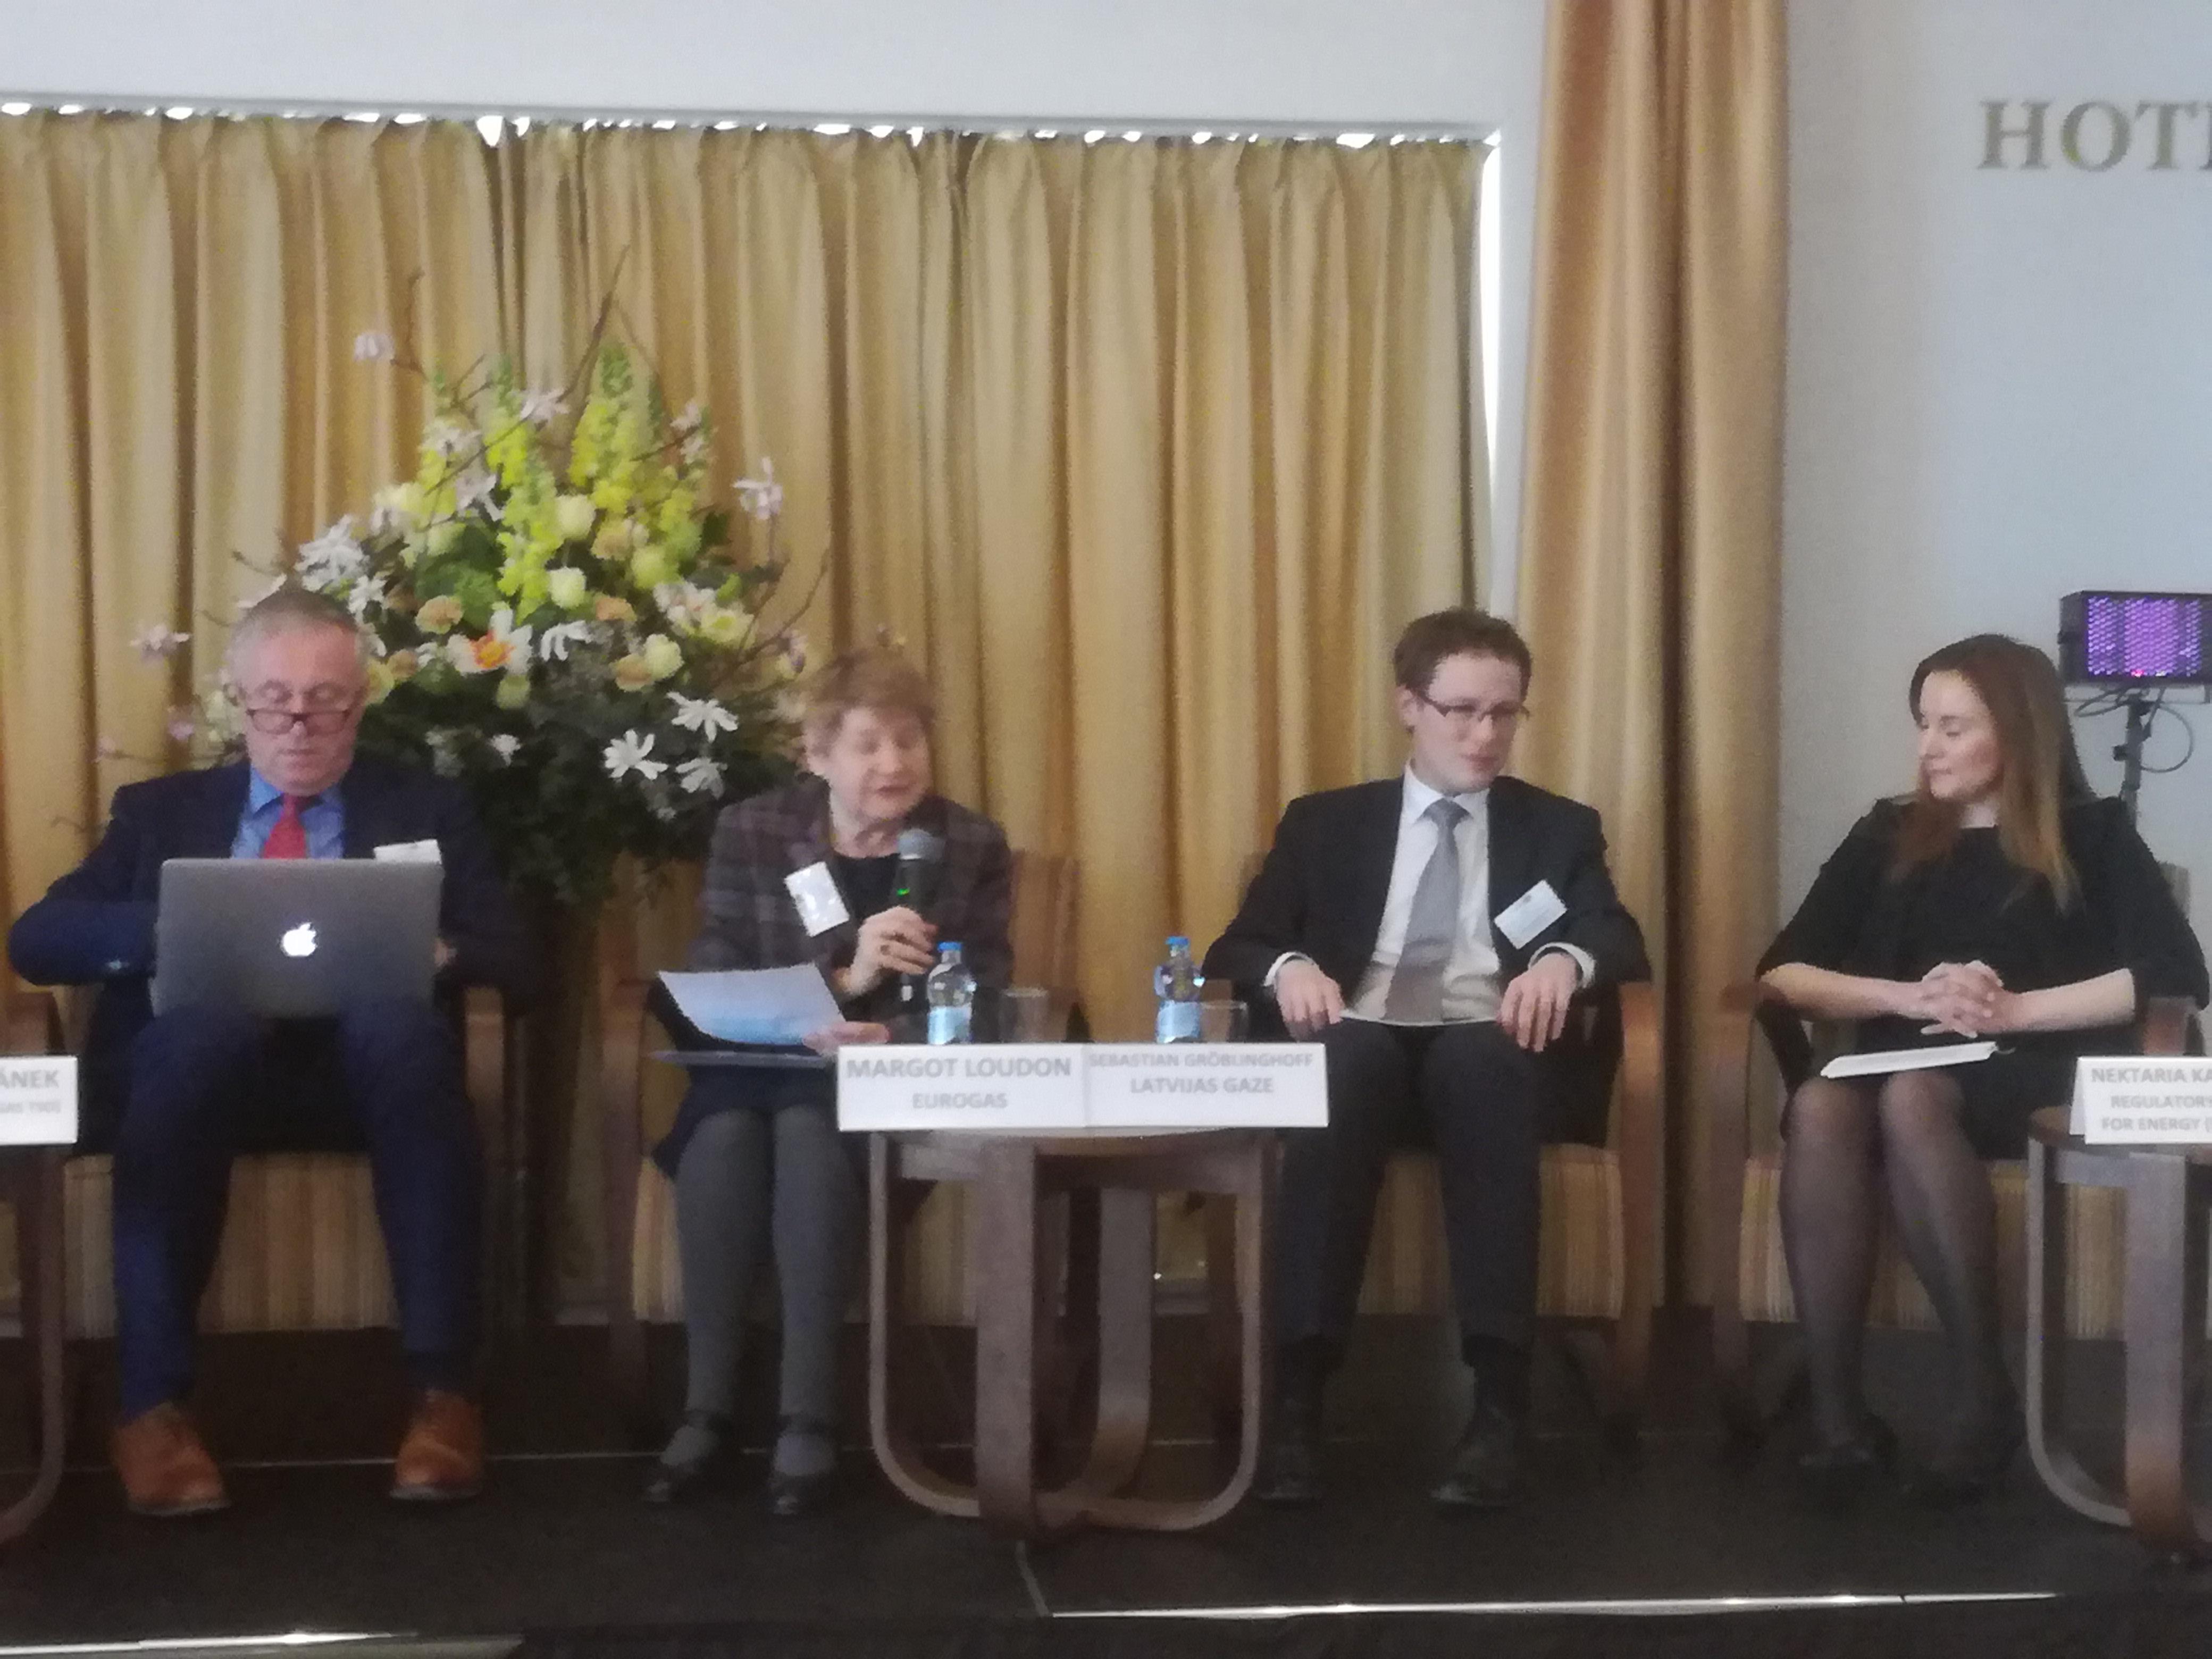 Zľava: Mirek Topolánek, Margot Loudonová, Sebastian Gröblinghoff, Nektaria Karakatsani